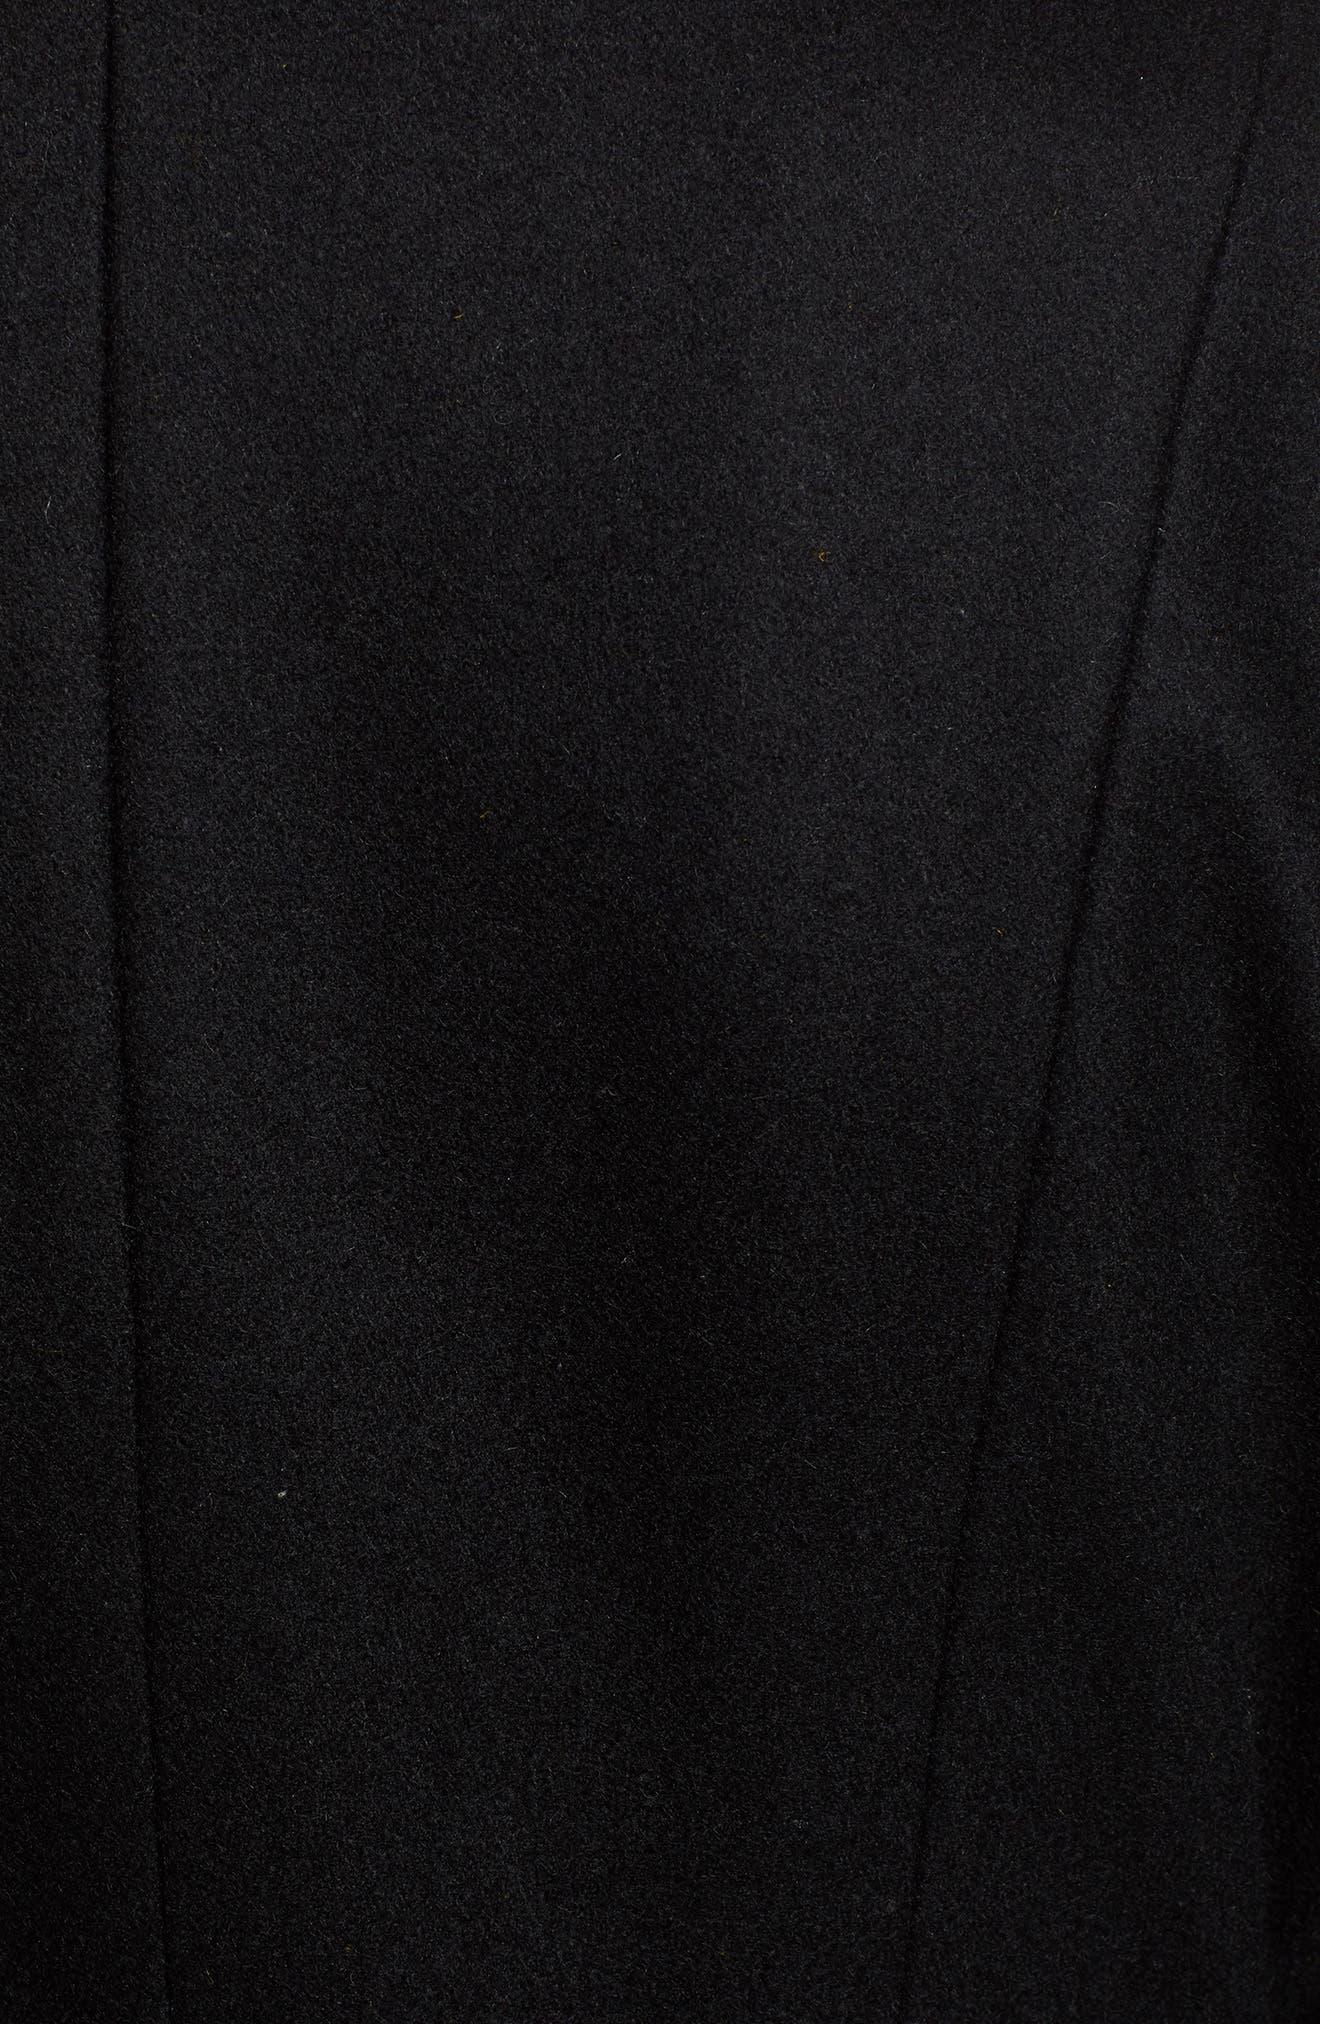 Elaine Boiled Wool Blend Coat,                             Alternate thumbnail 7, color,                             BLACK